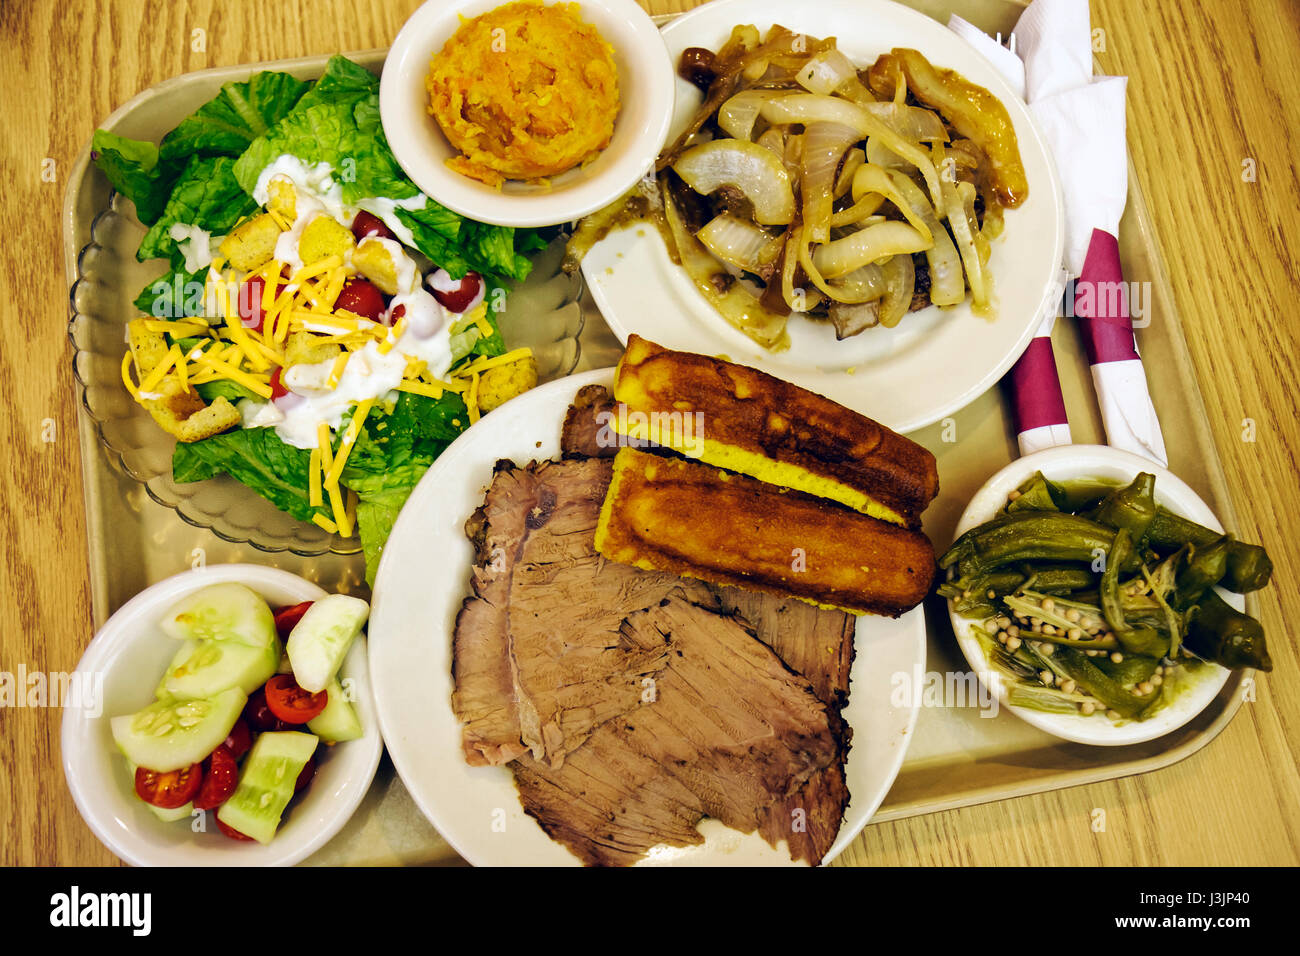 Miami Florida restaurante Piccadilly Cafeteria comida casual placas ...